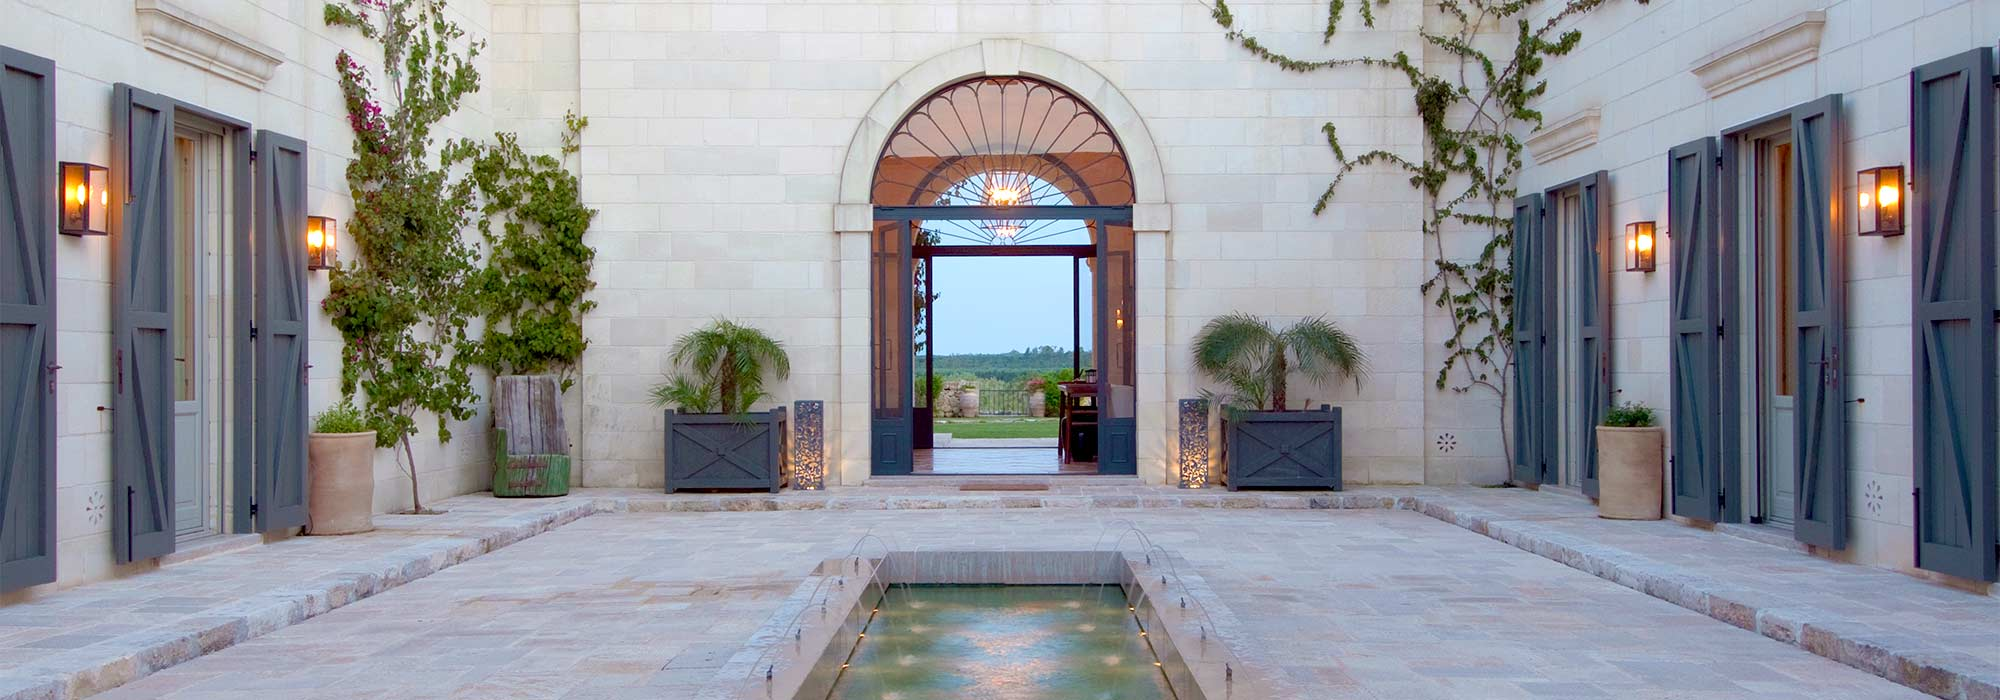 Masseria La Spinetta – Luxury Puglia Holiday Villa- Sleeps 10/12